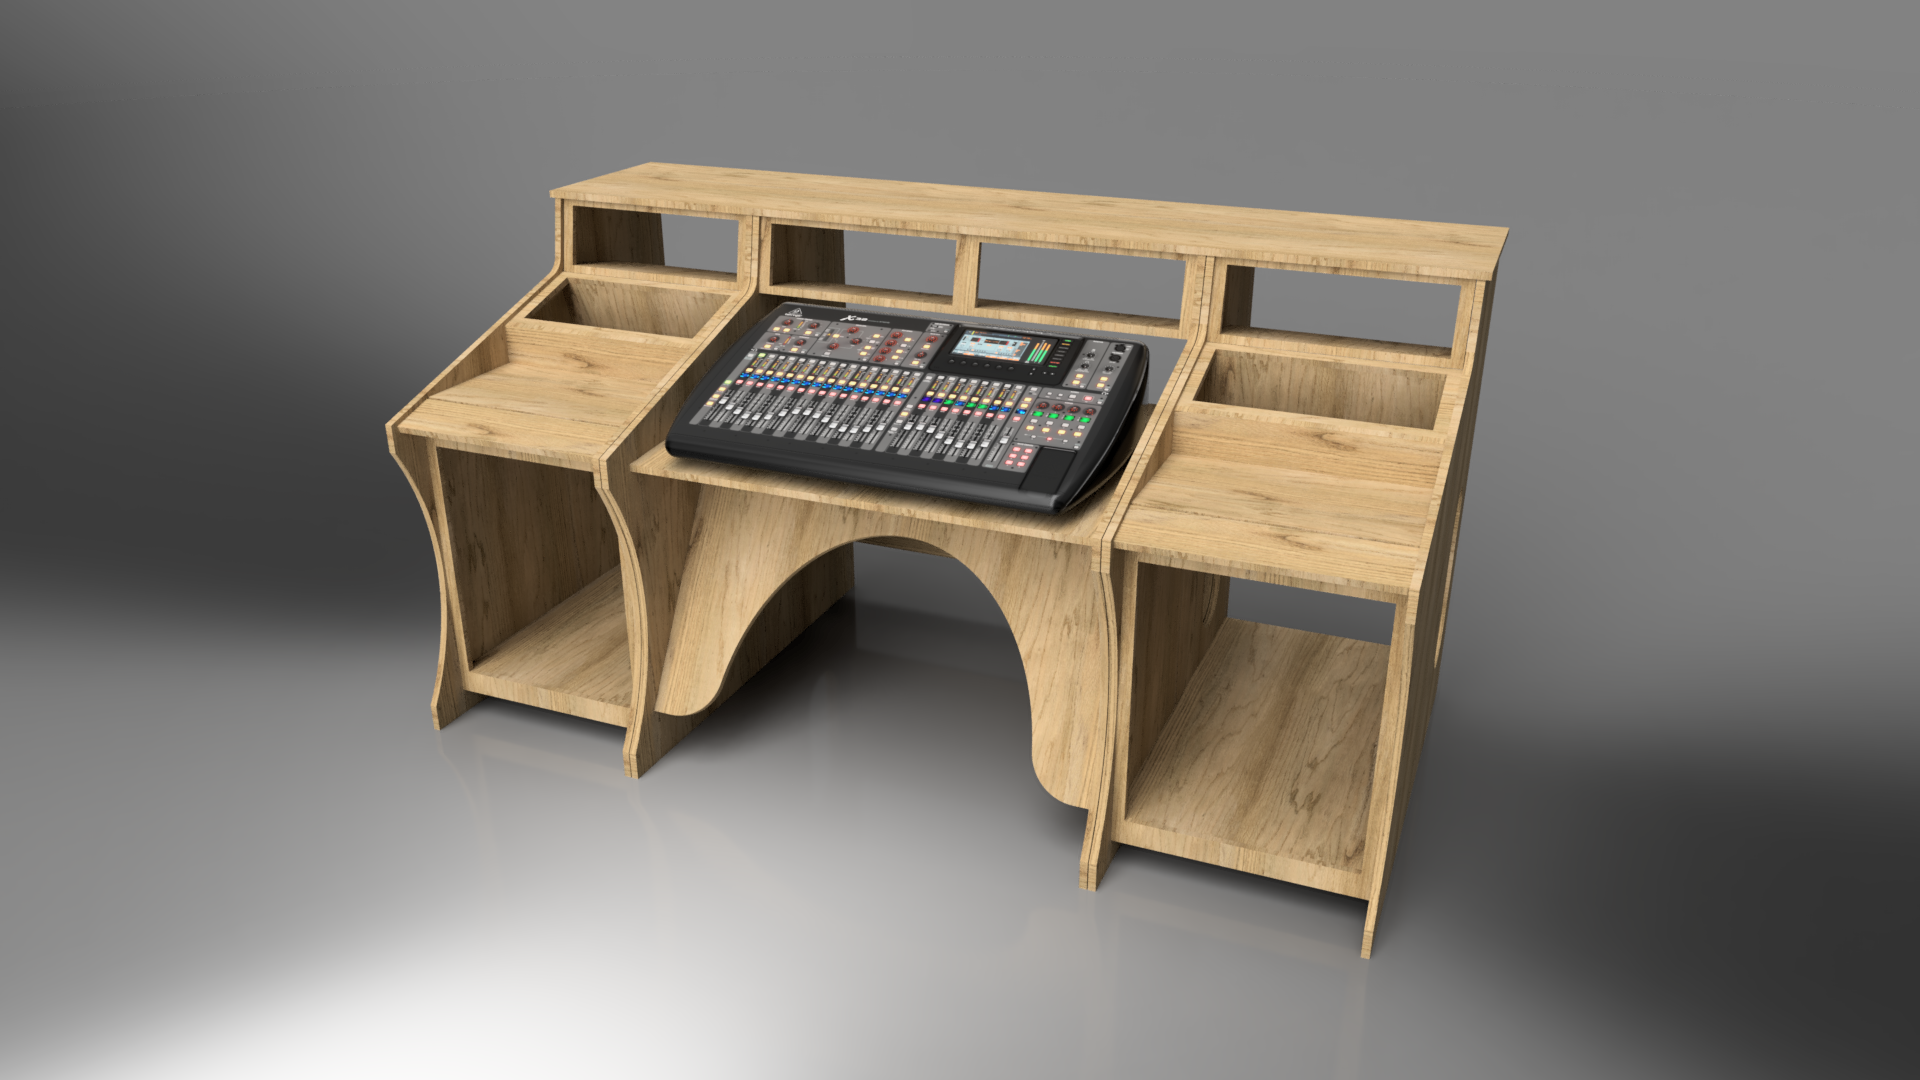 meuble pour x32 type studio studios d